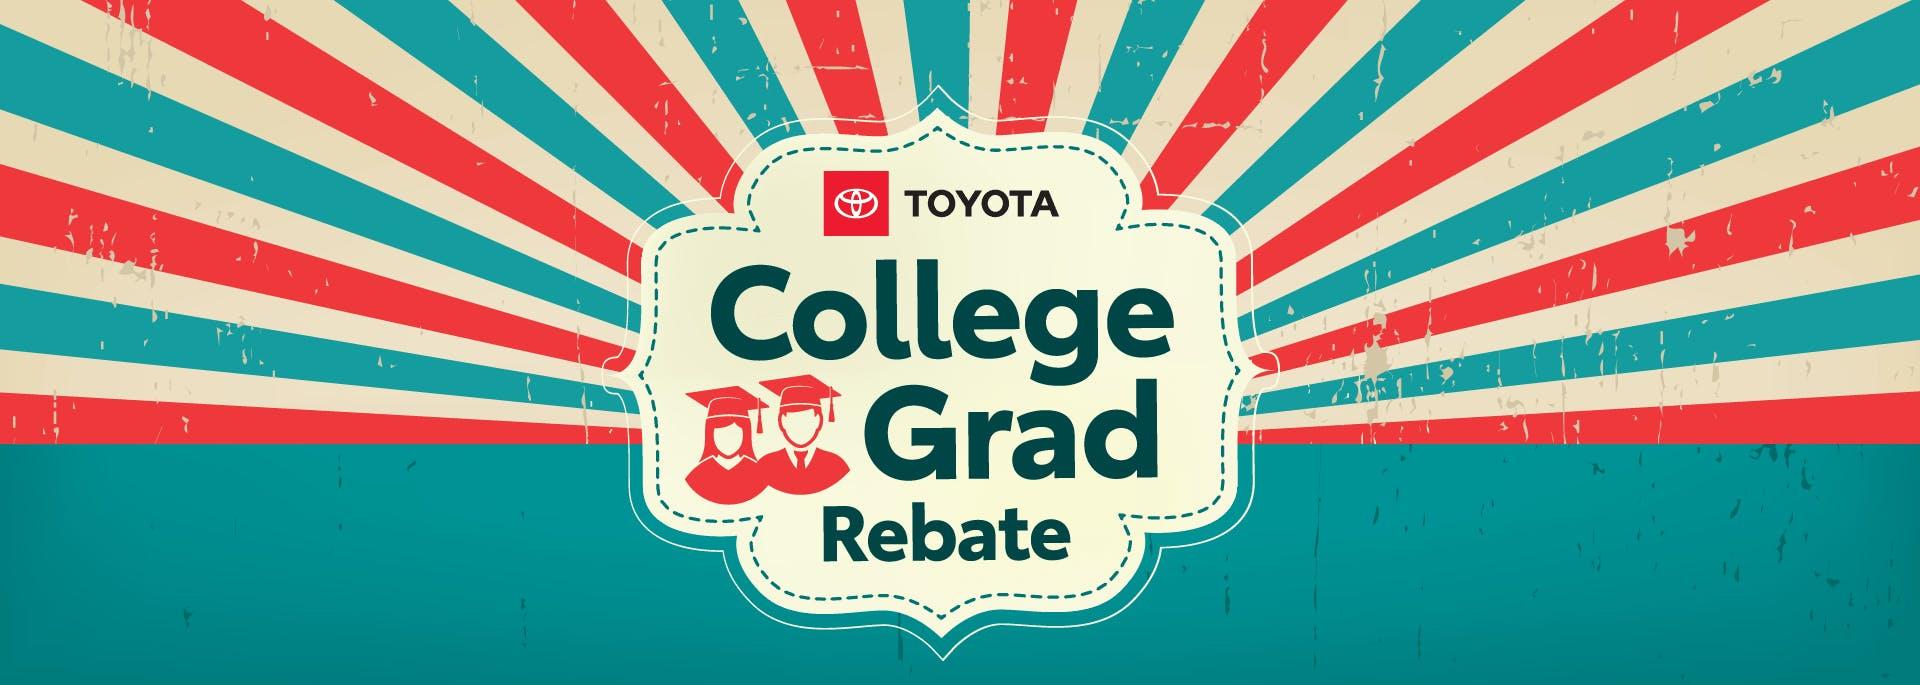 Toyota College Graduate Program near Hubbard OH